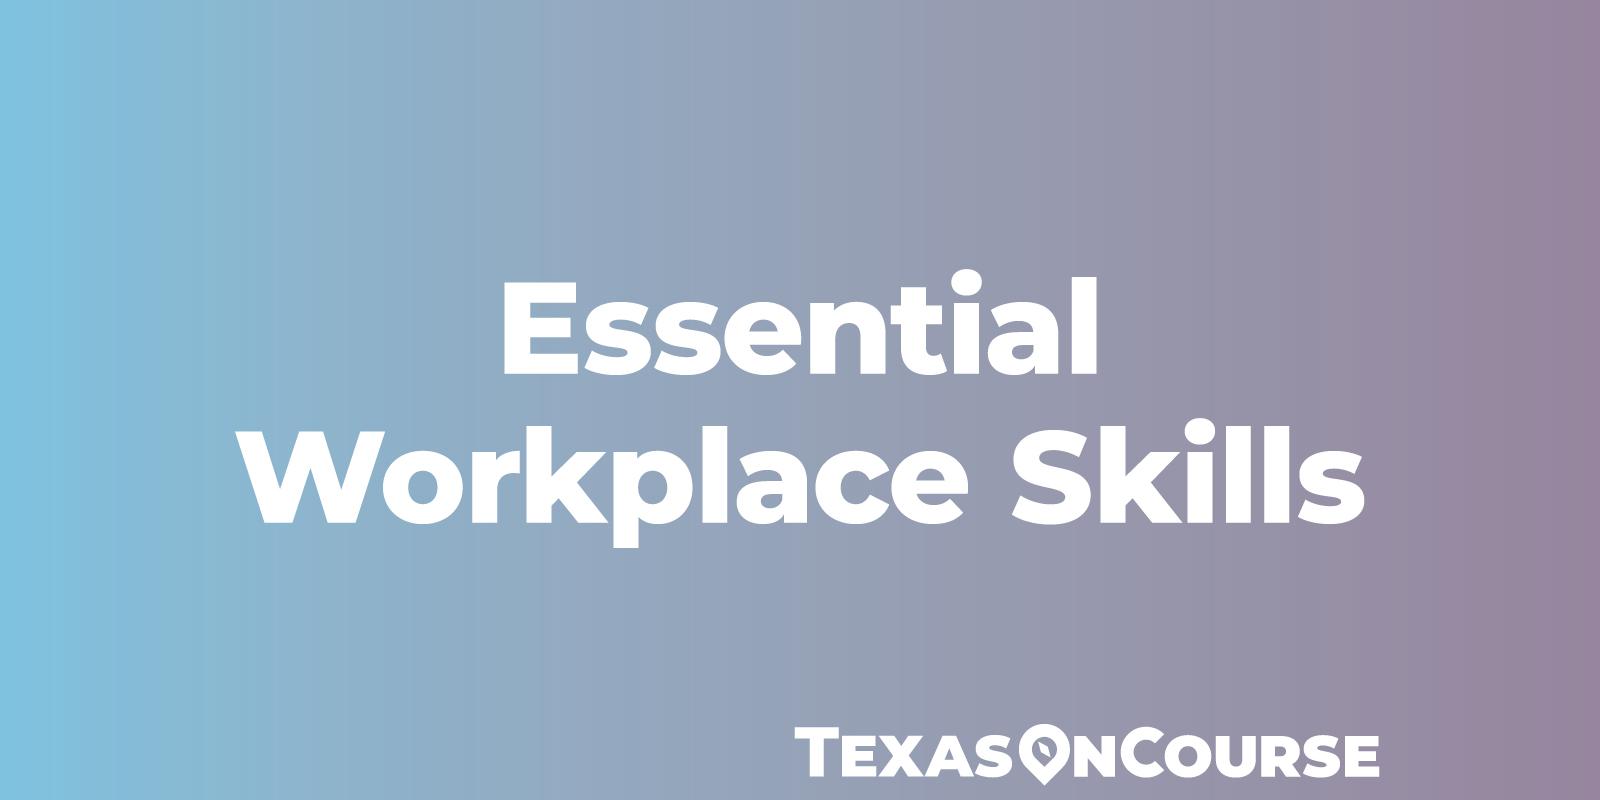 Essential Workplace Skills